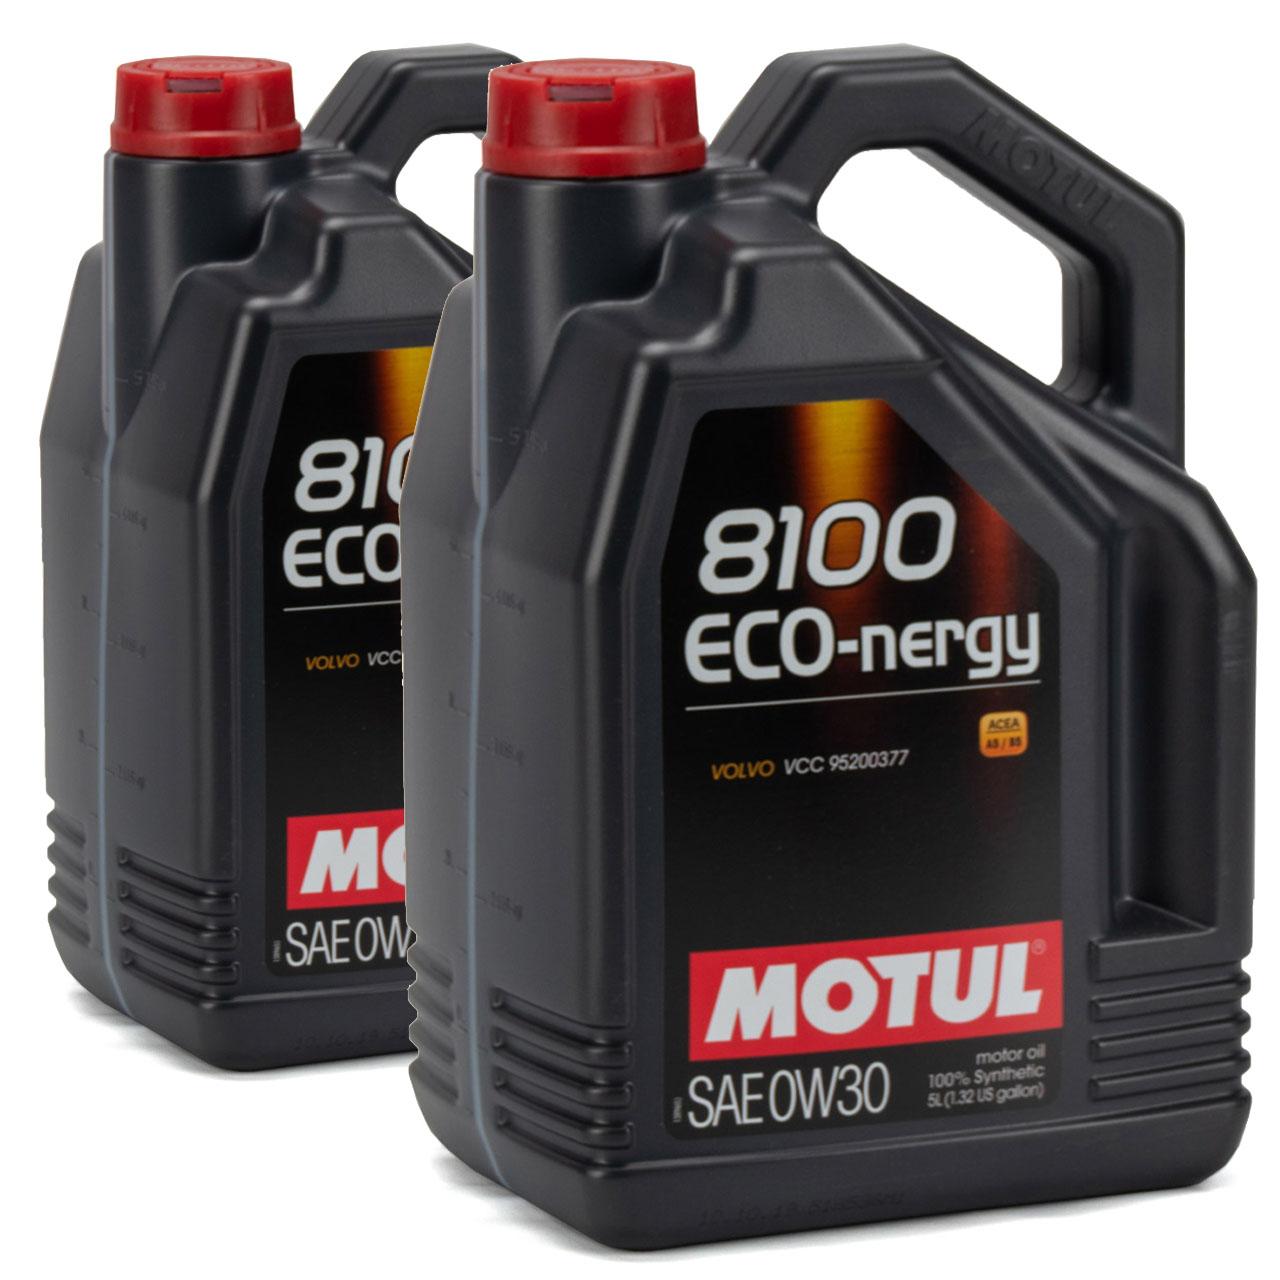 MOTUL 8100 ECO-nergy Motoröl Öl 0W30 ACEA A5/B5 VOLVO VCC95200377 - 10L 10 Liter